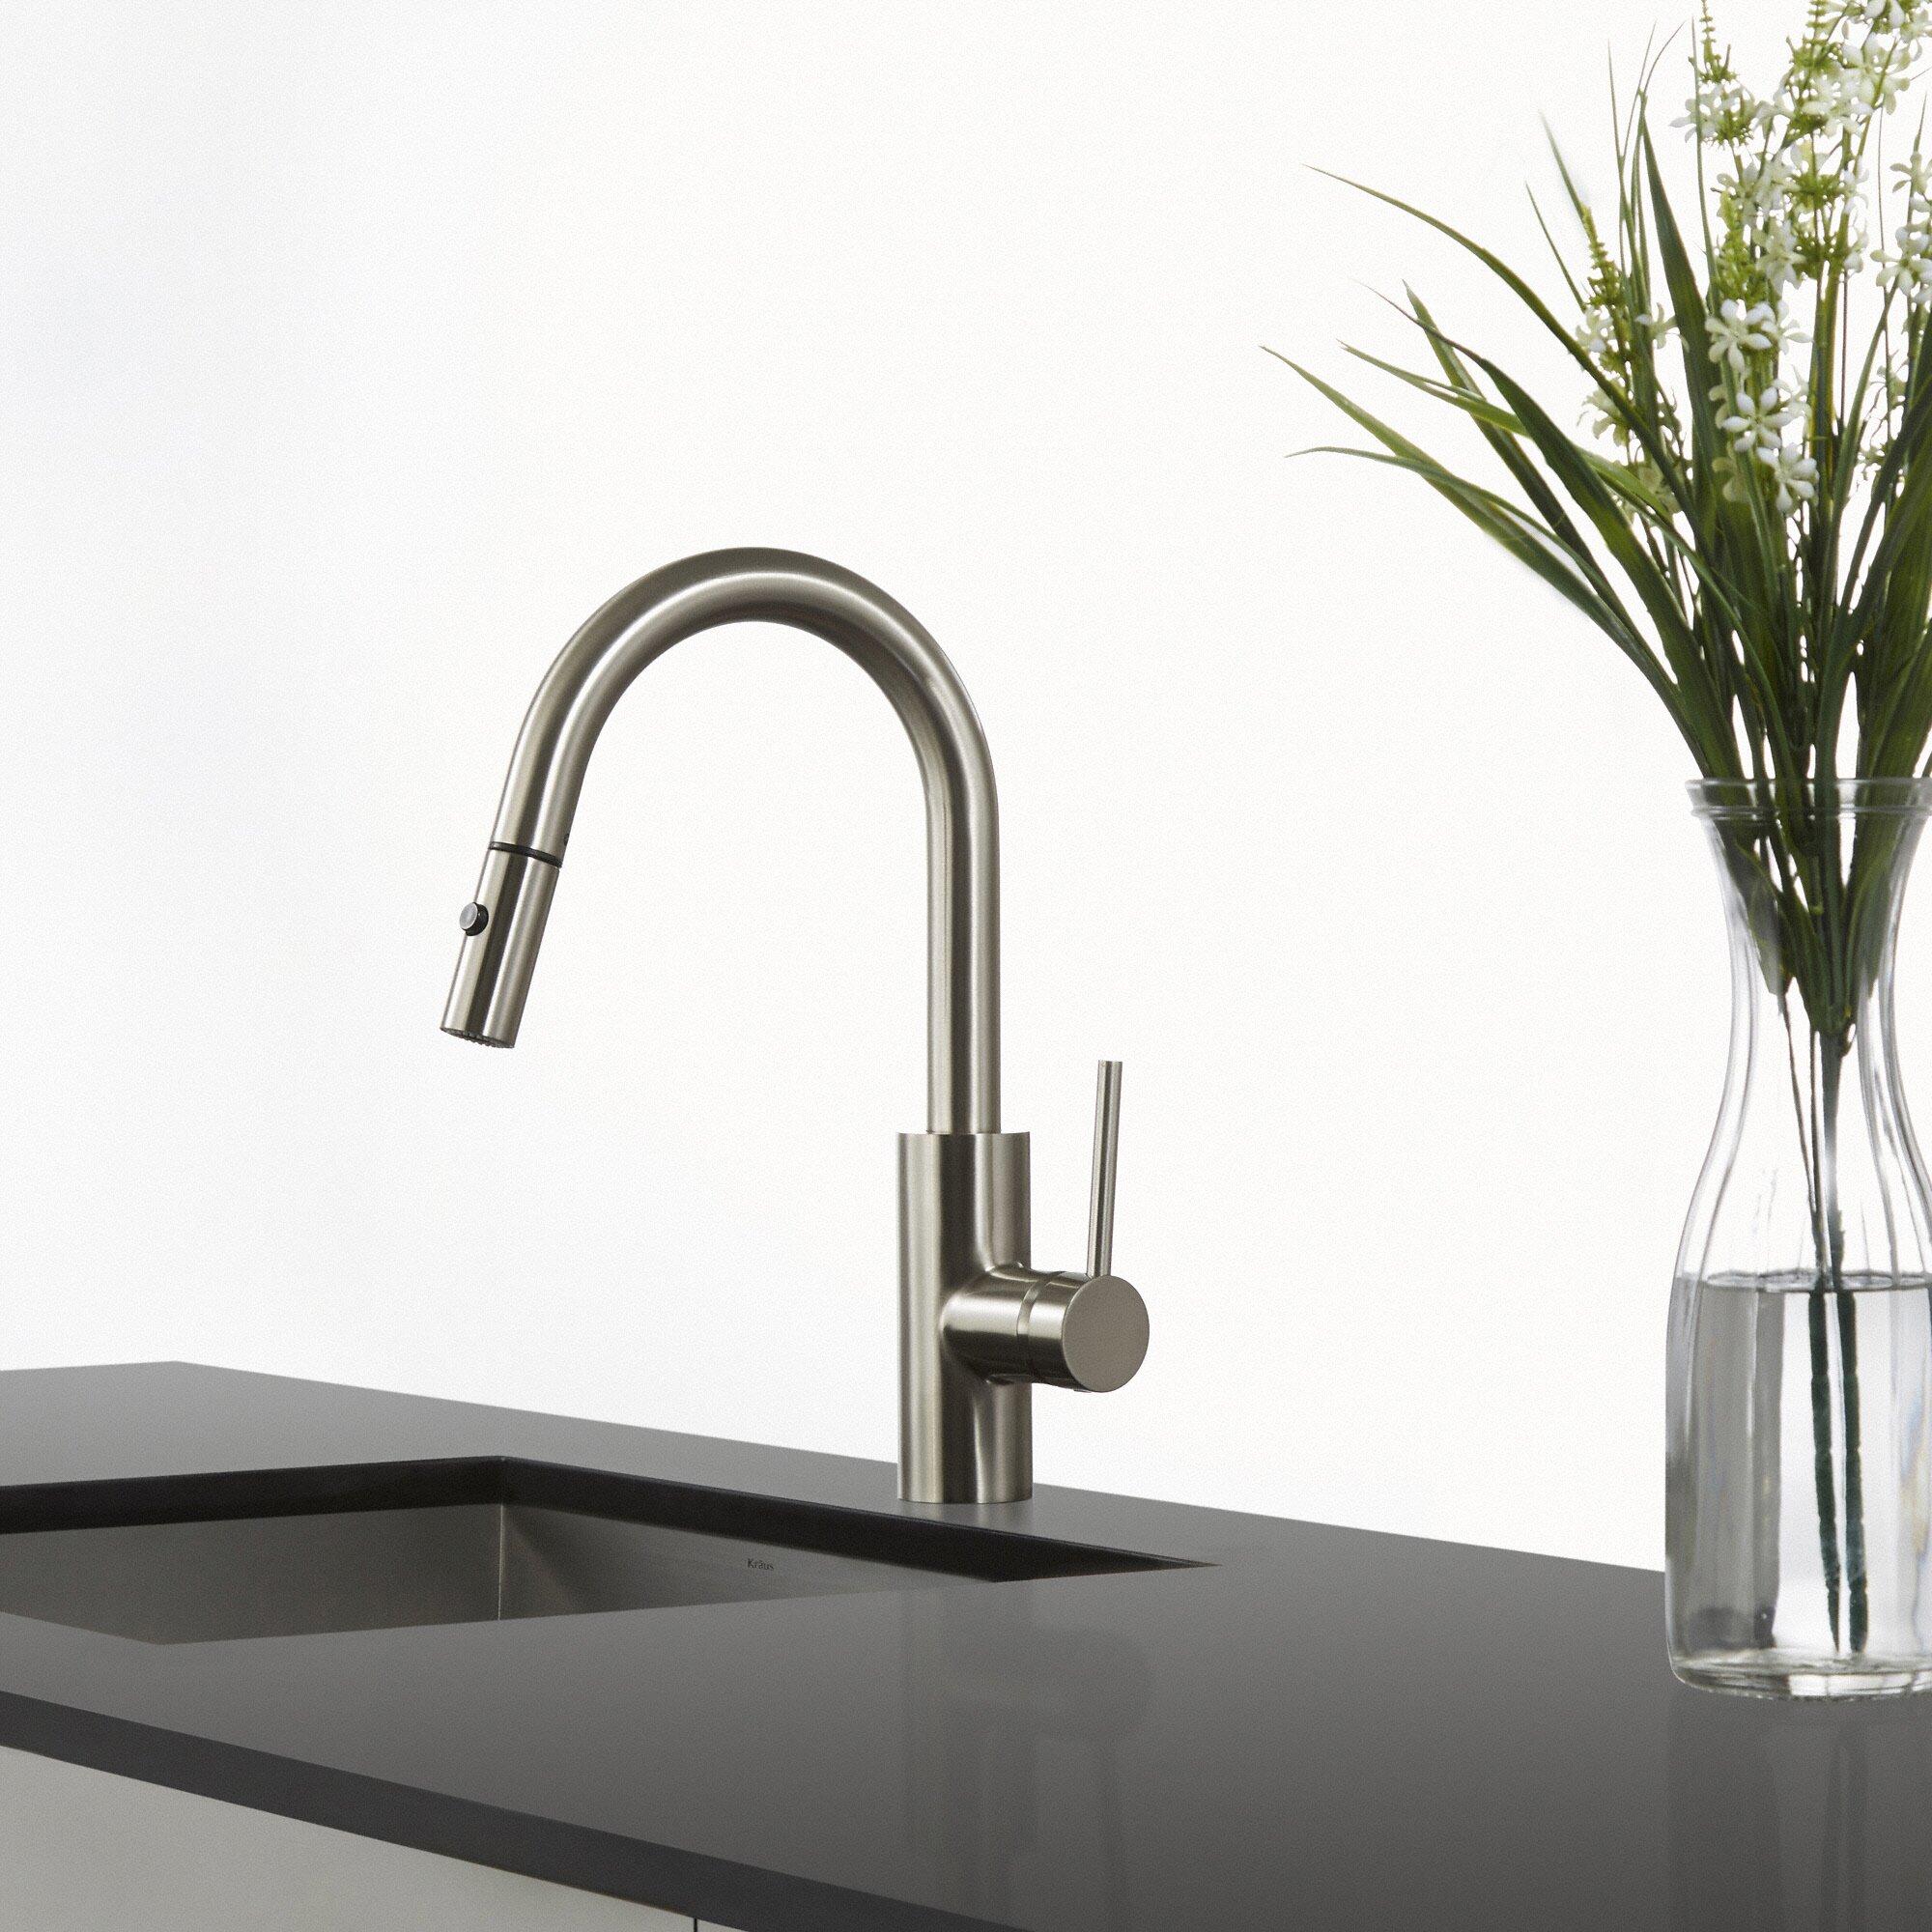 kraus mateo single lever pull down kitchen faucet kraus mateo single lever pull down kitchen faucet